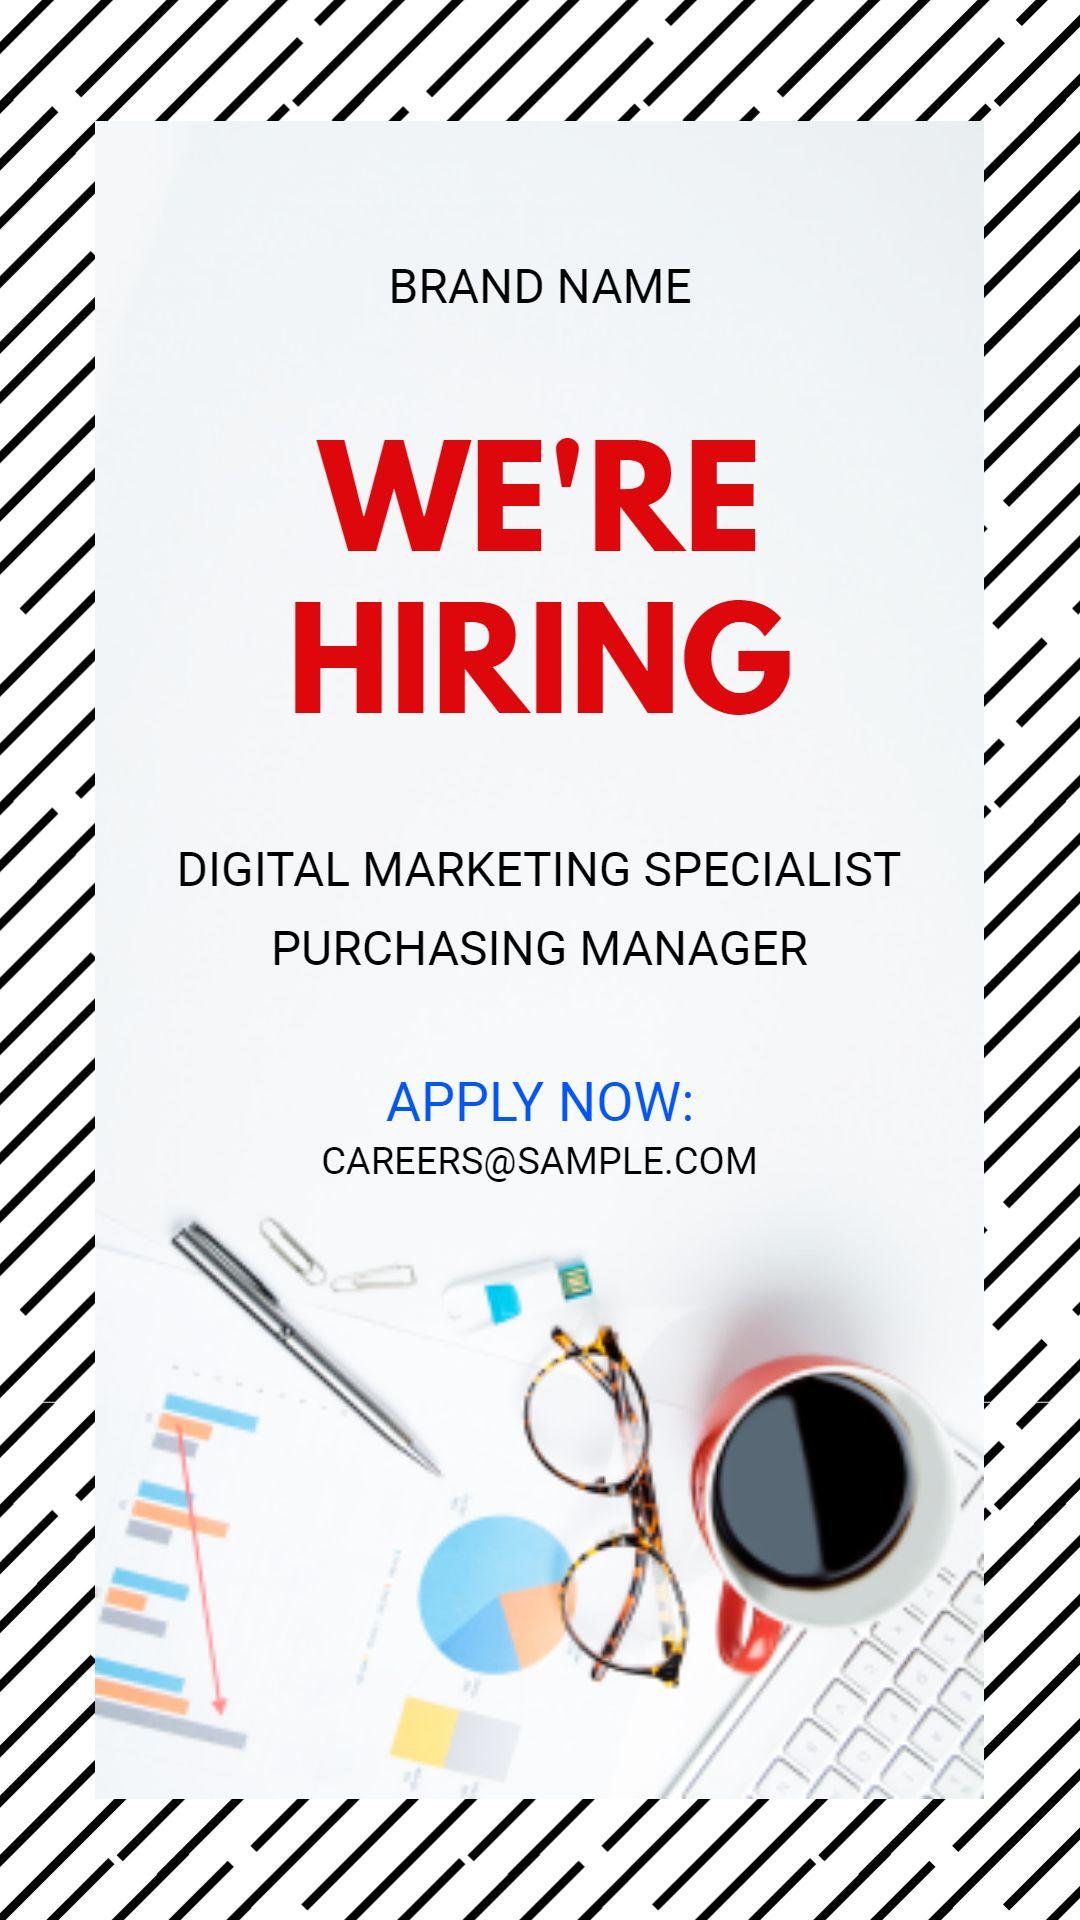 Brand Job Vacancy Instagram Story Ad Template Instagram Story